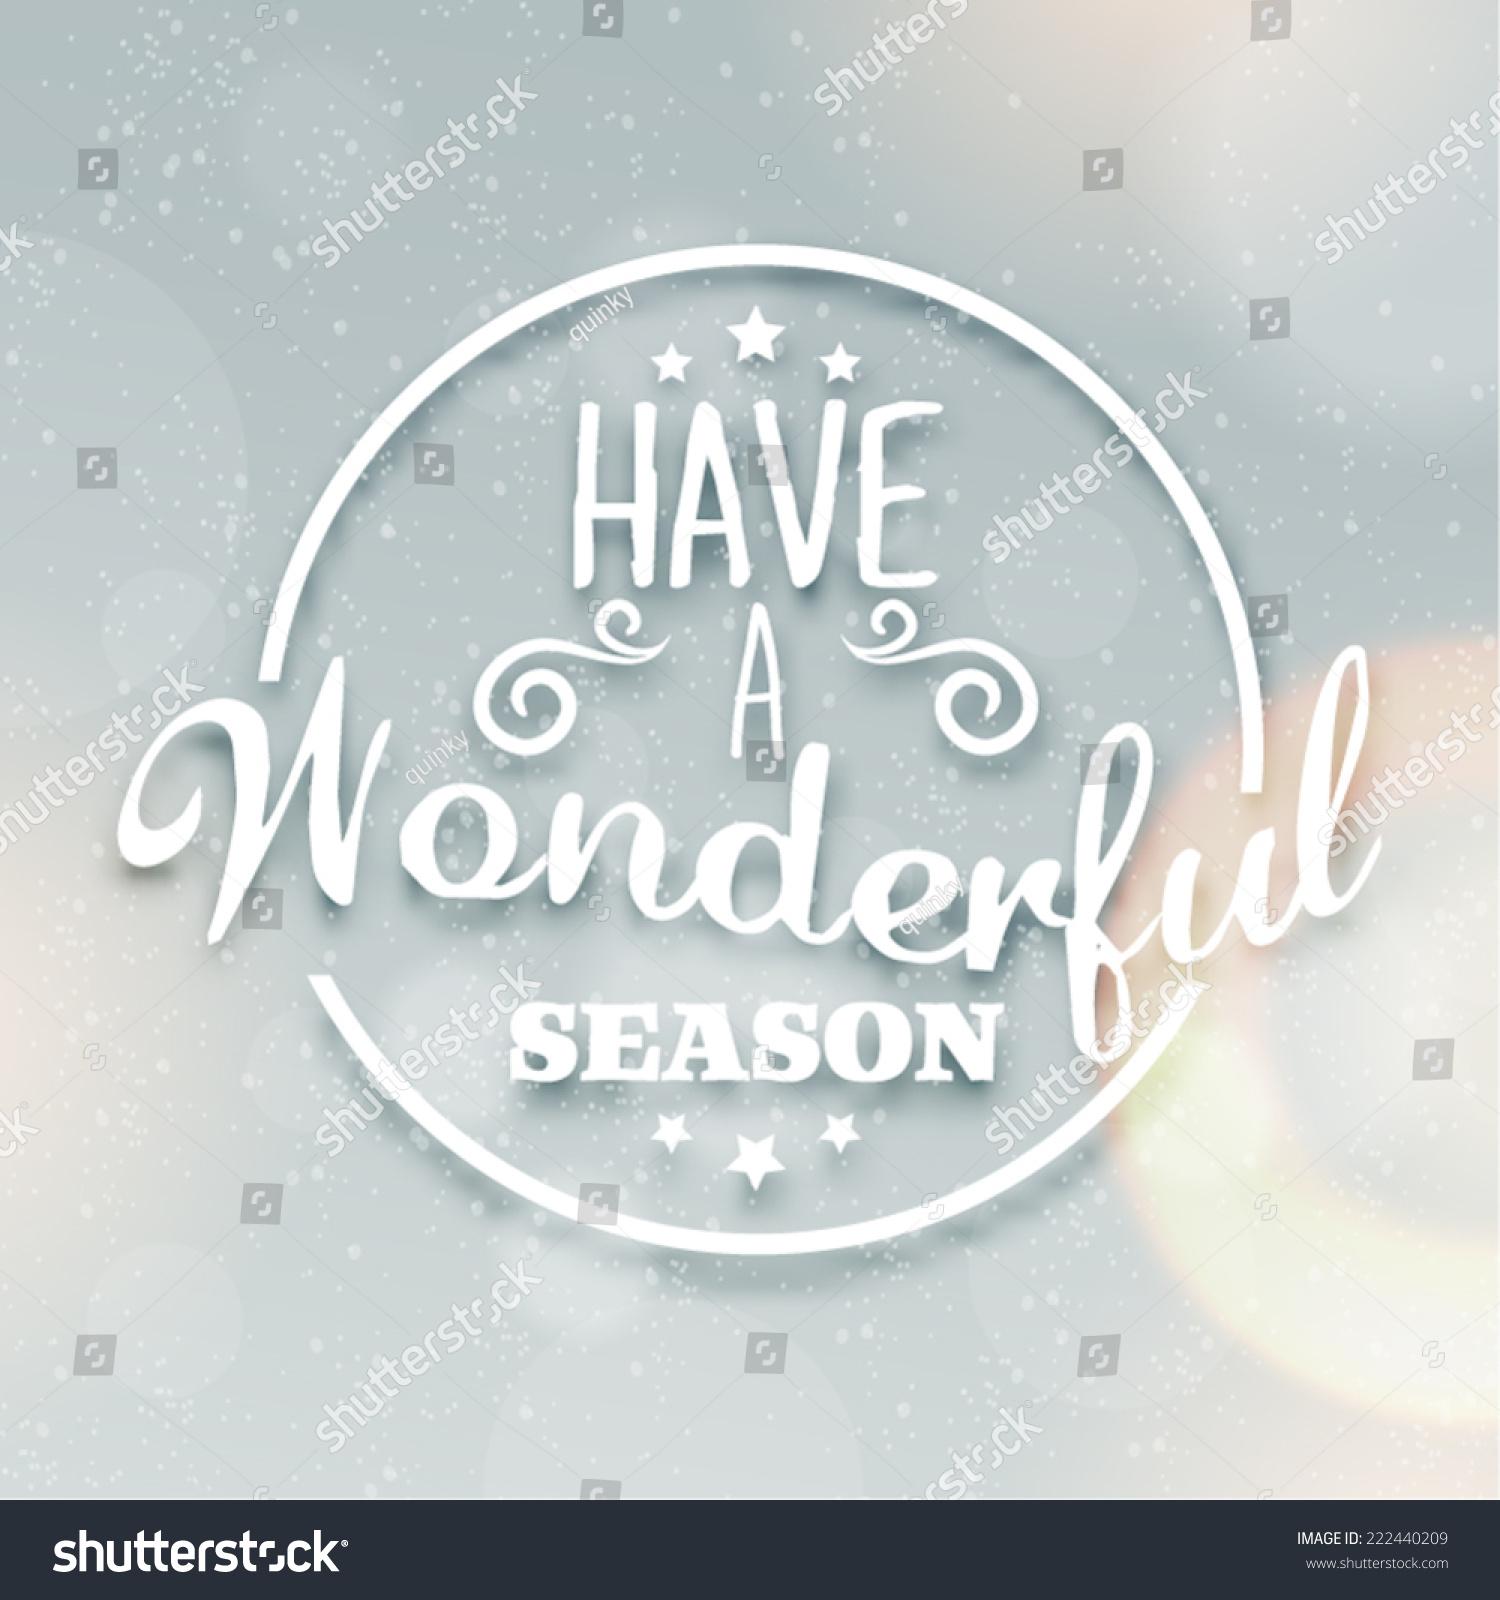 Merry Christmas Season Greetings Quote Vector Stock Vector Royalty